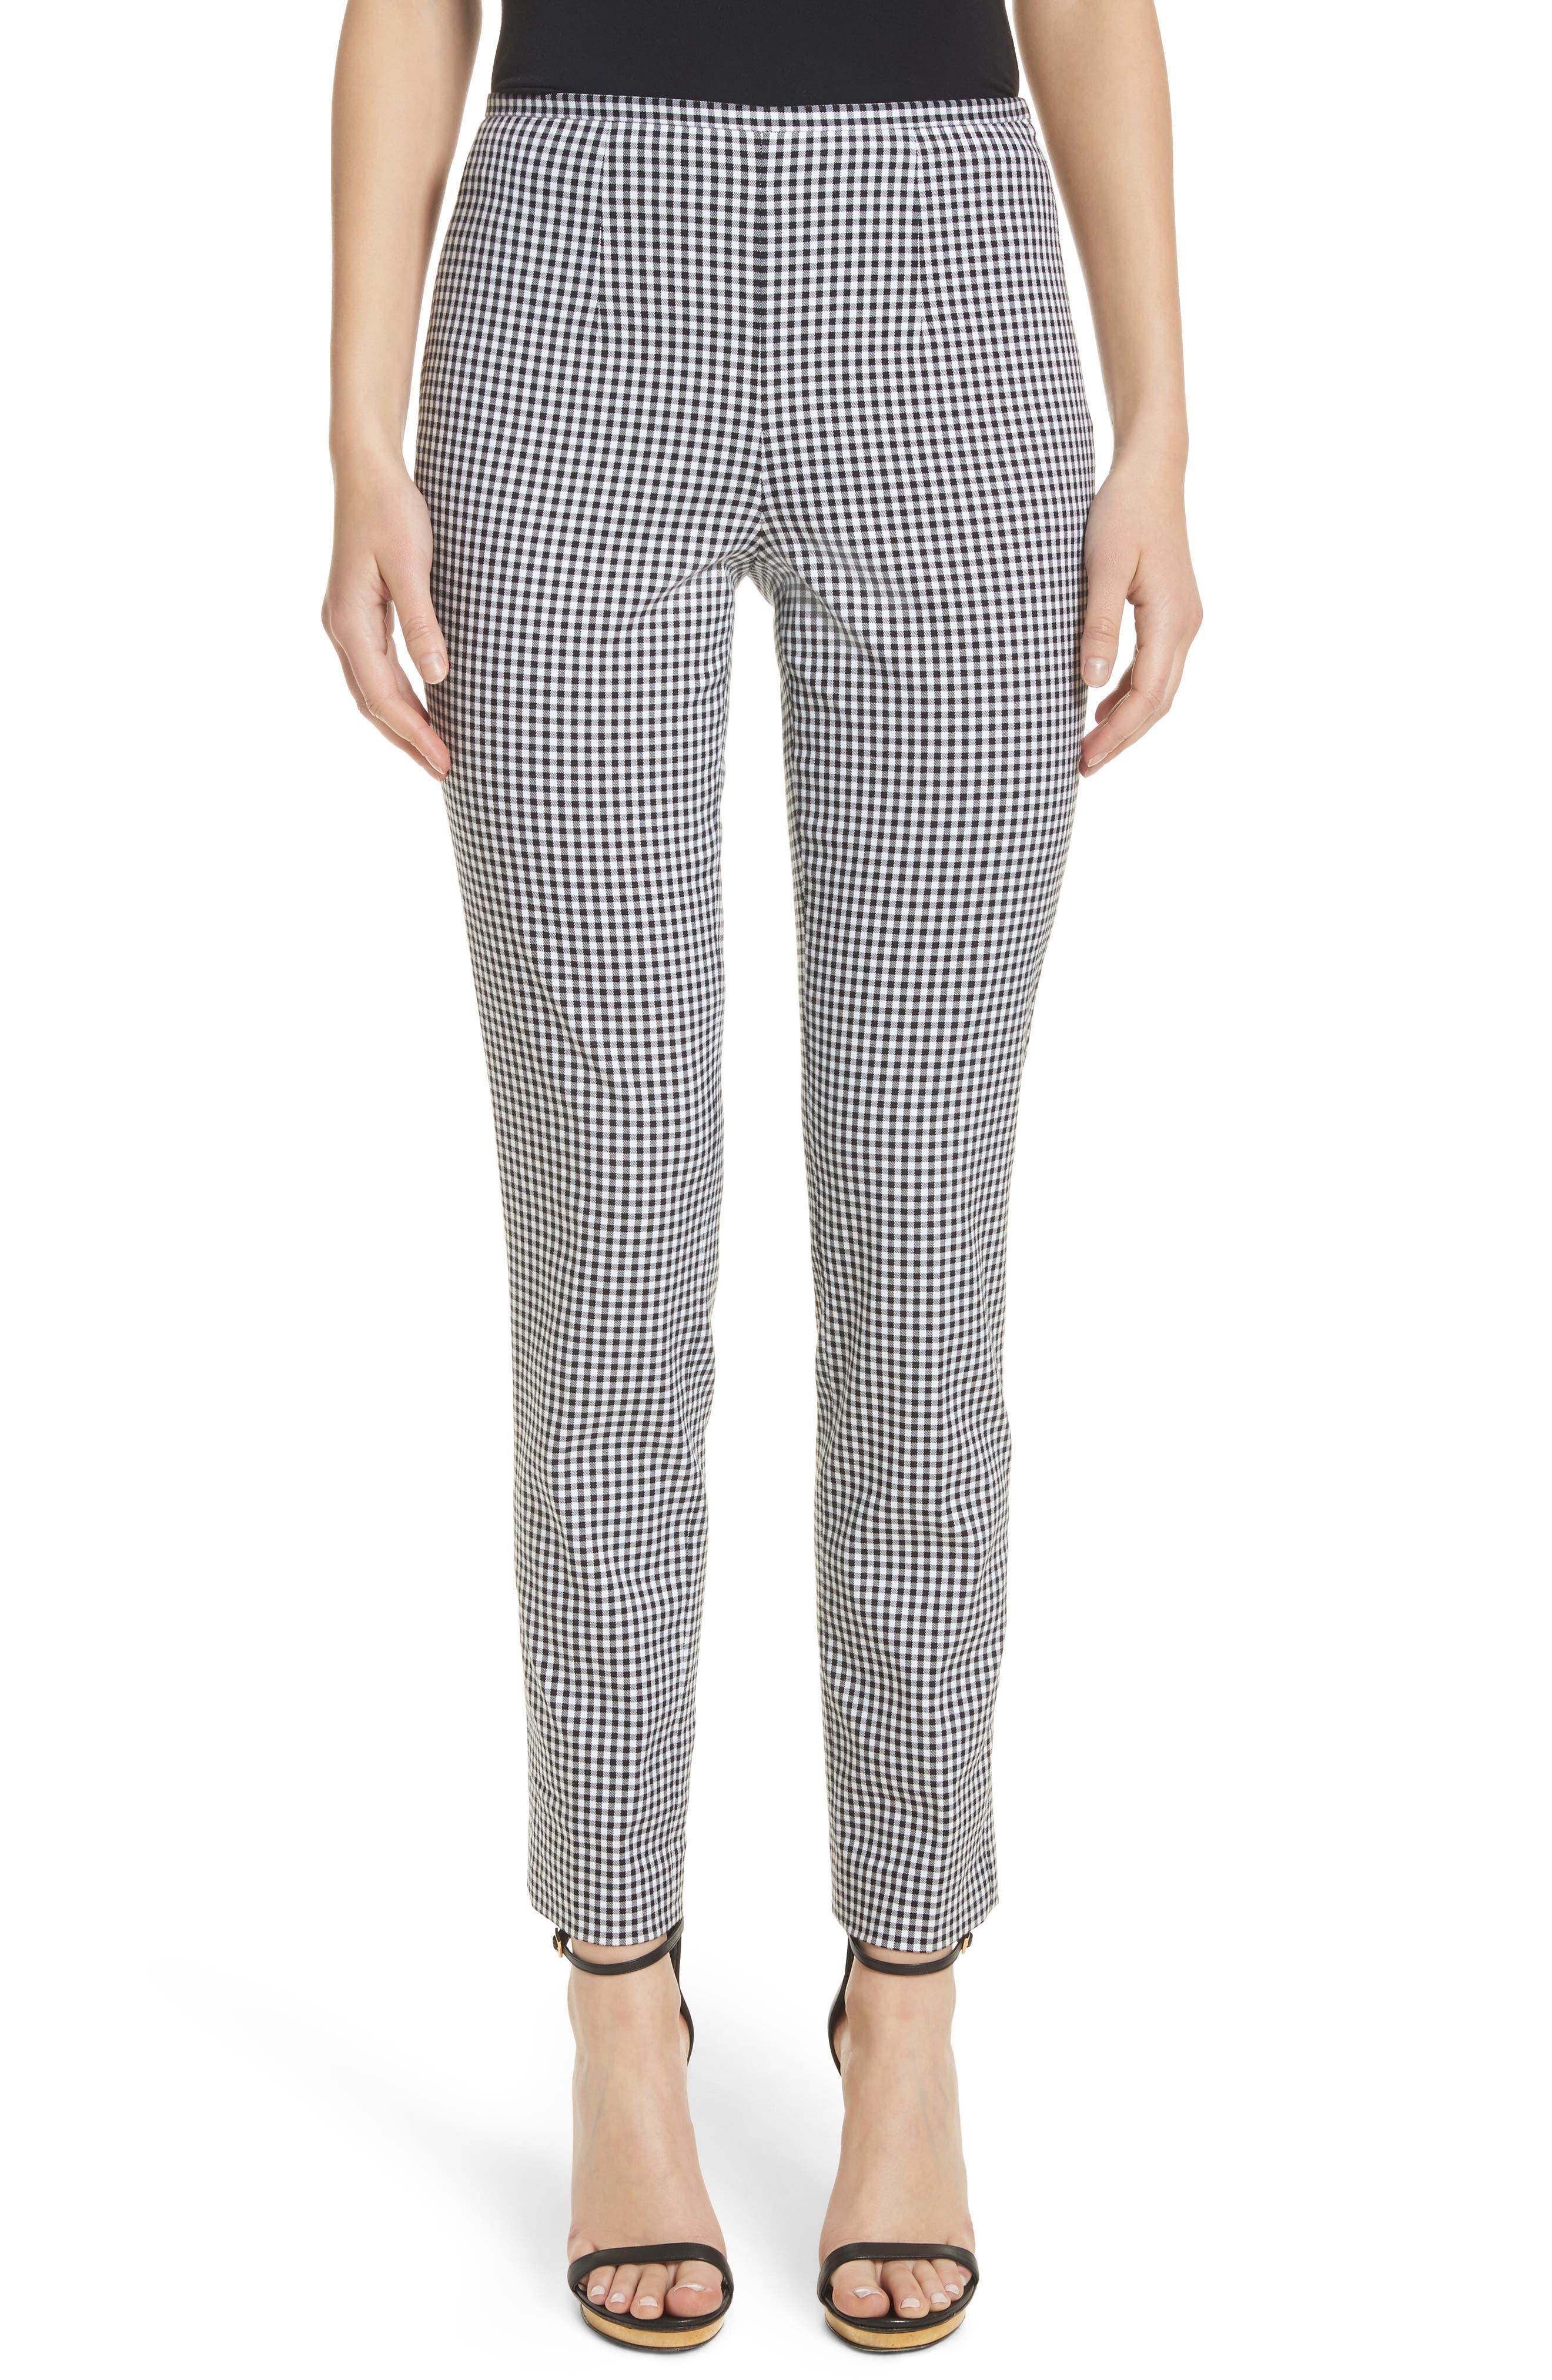 Gingham Stretch Cotton Pants,                         Main,                         color, Black / White